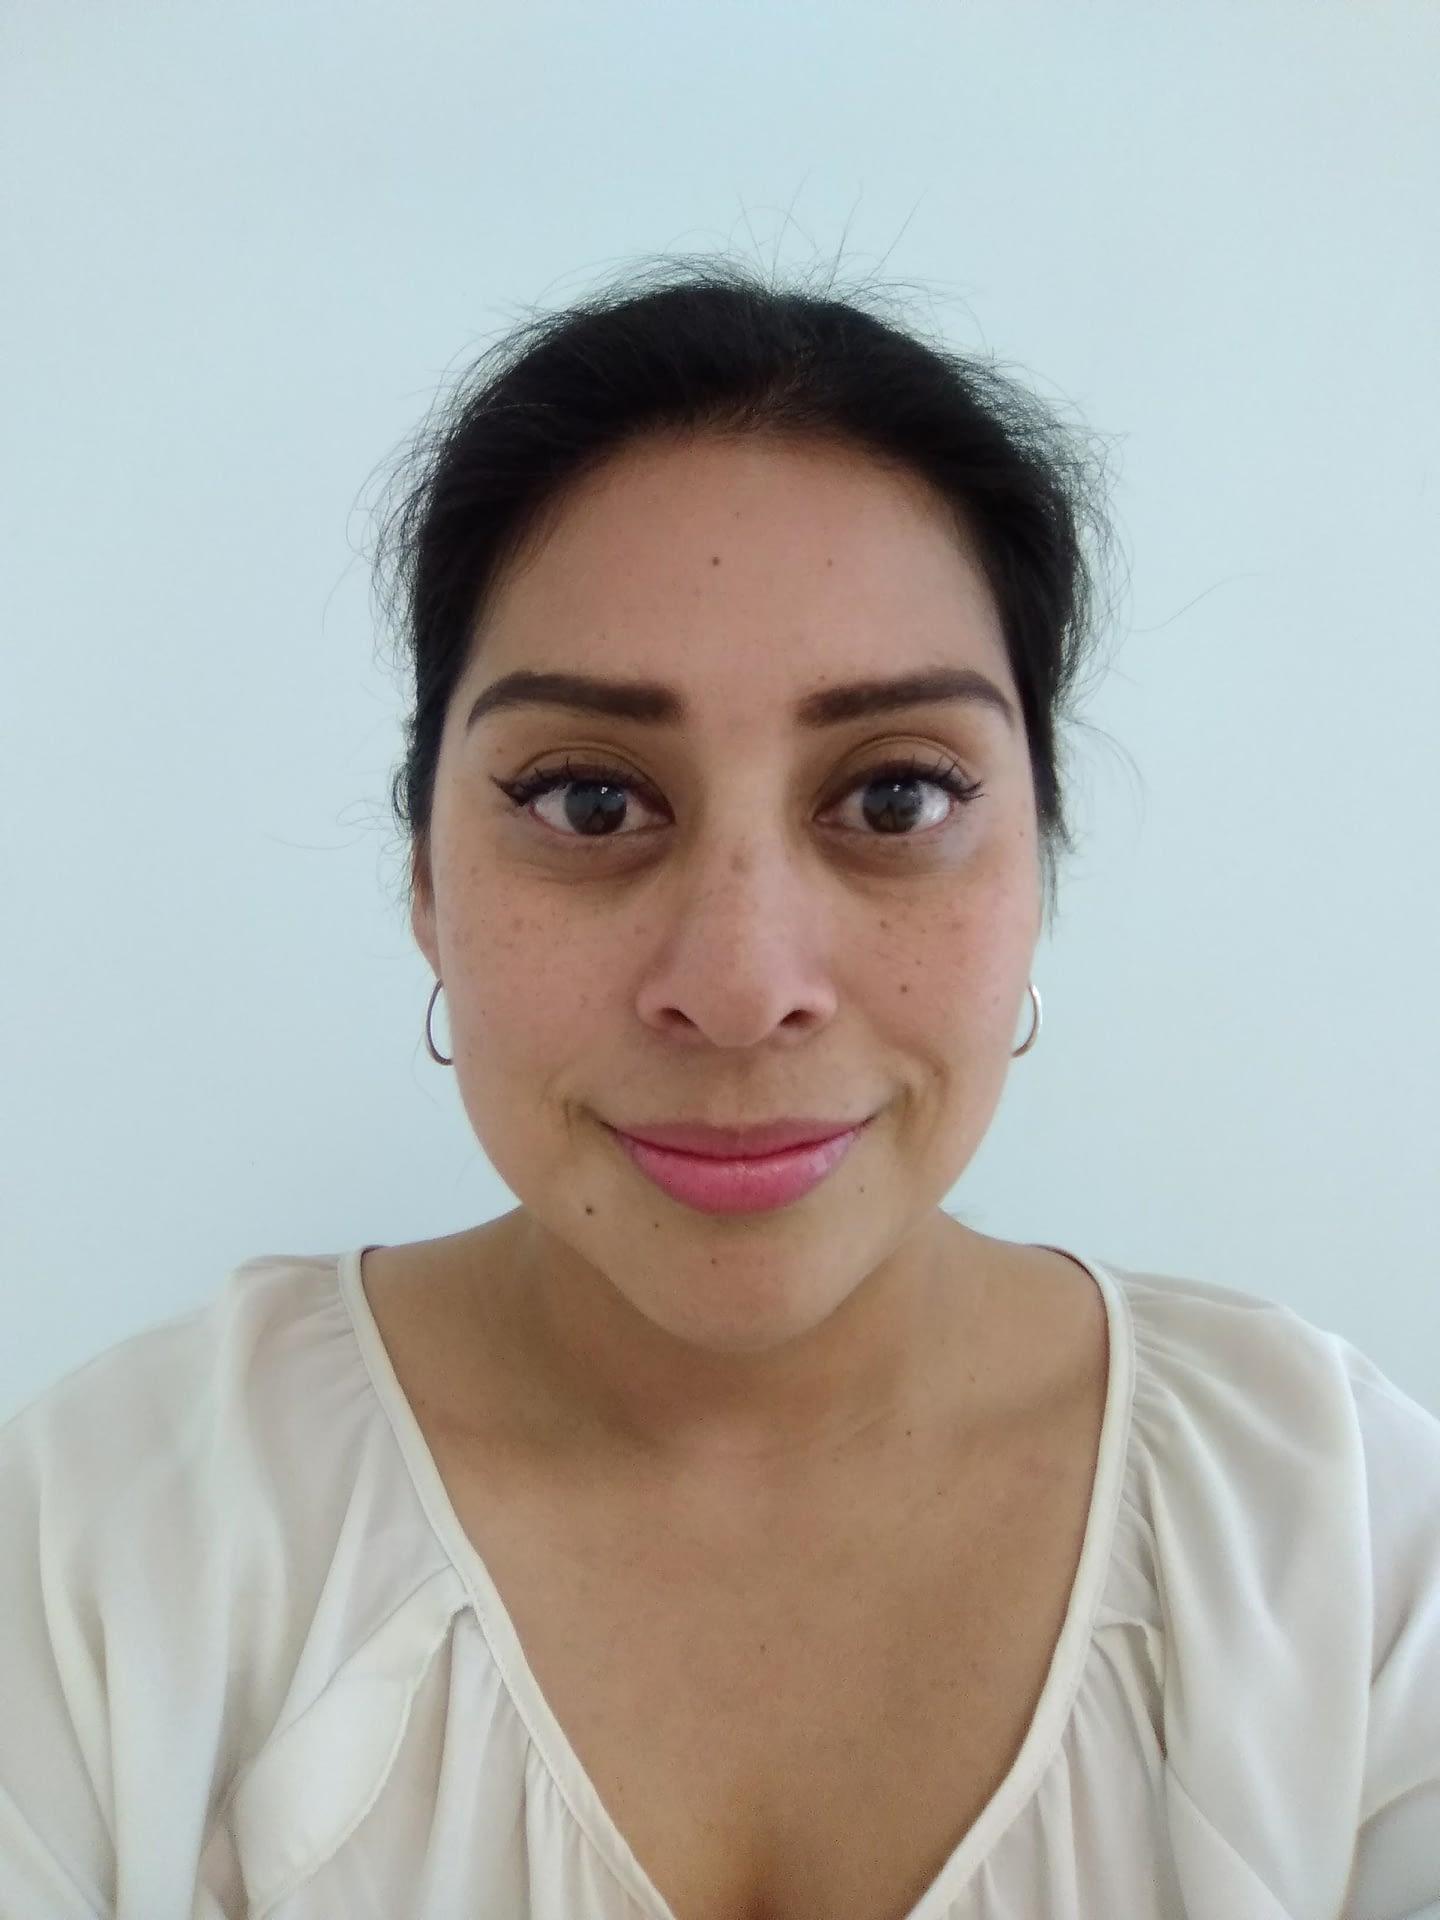 Profile image for Maria Elena Campos Saucedo